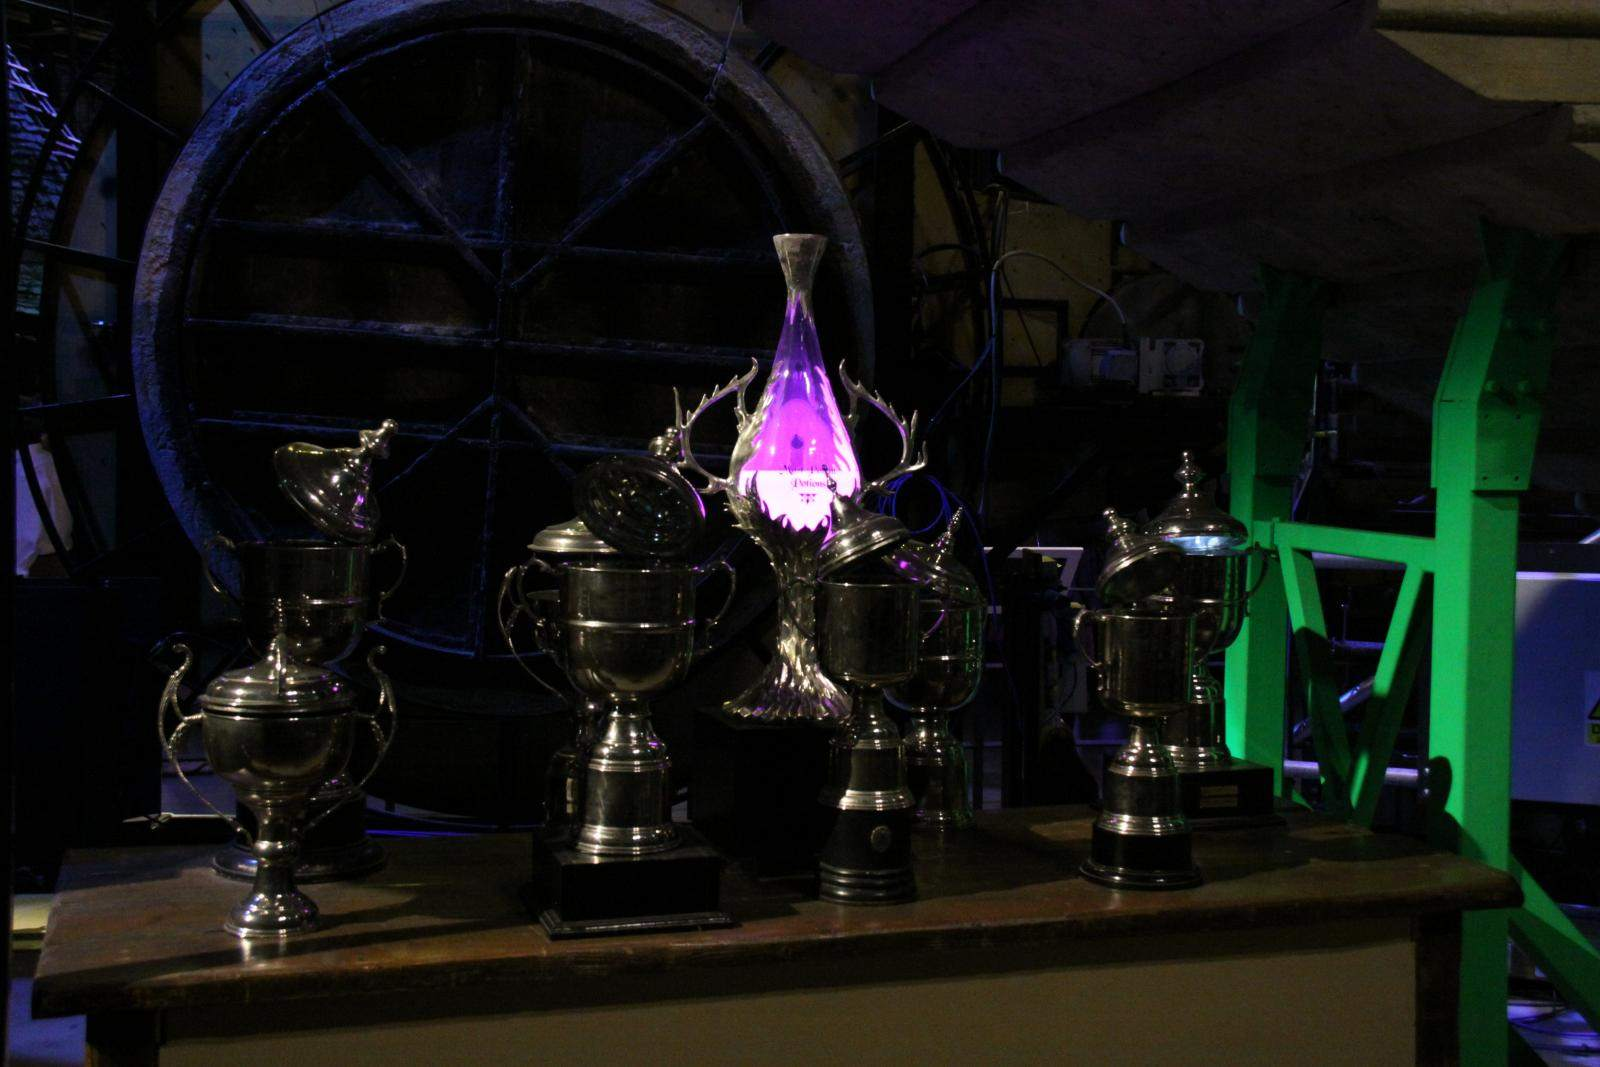 making harry potter10 The Making of Harry Potter, Warner Bros Studio London